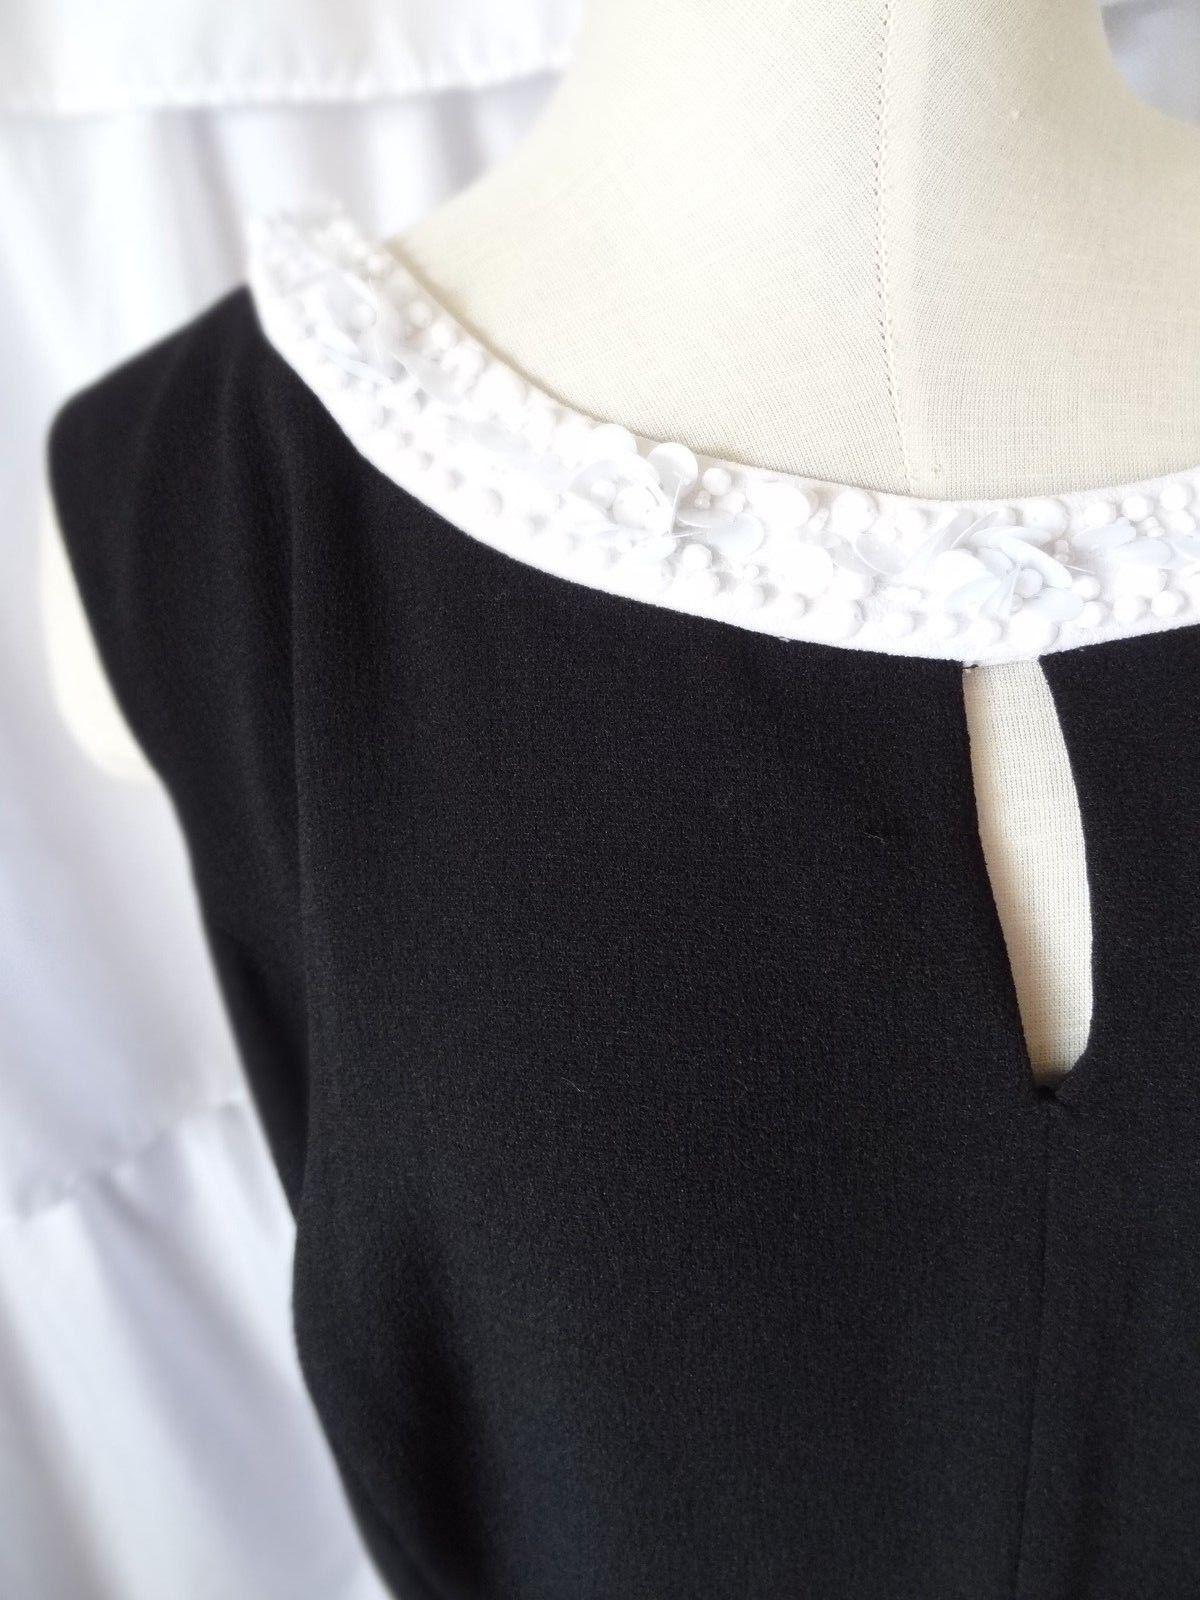 Sangria Black /& Gray Geometric Cap Sleeve Sheath Dress Sz 4,6,8,16 NWT